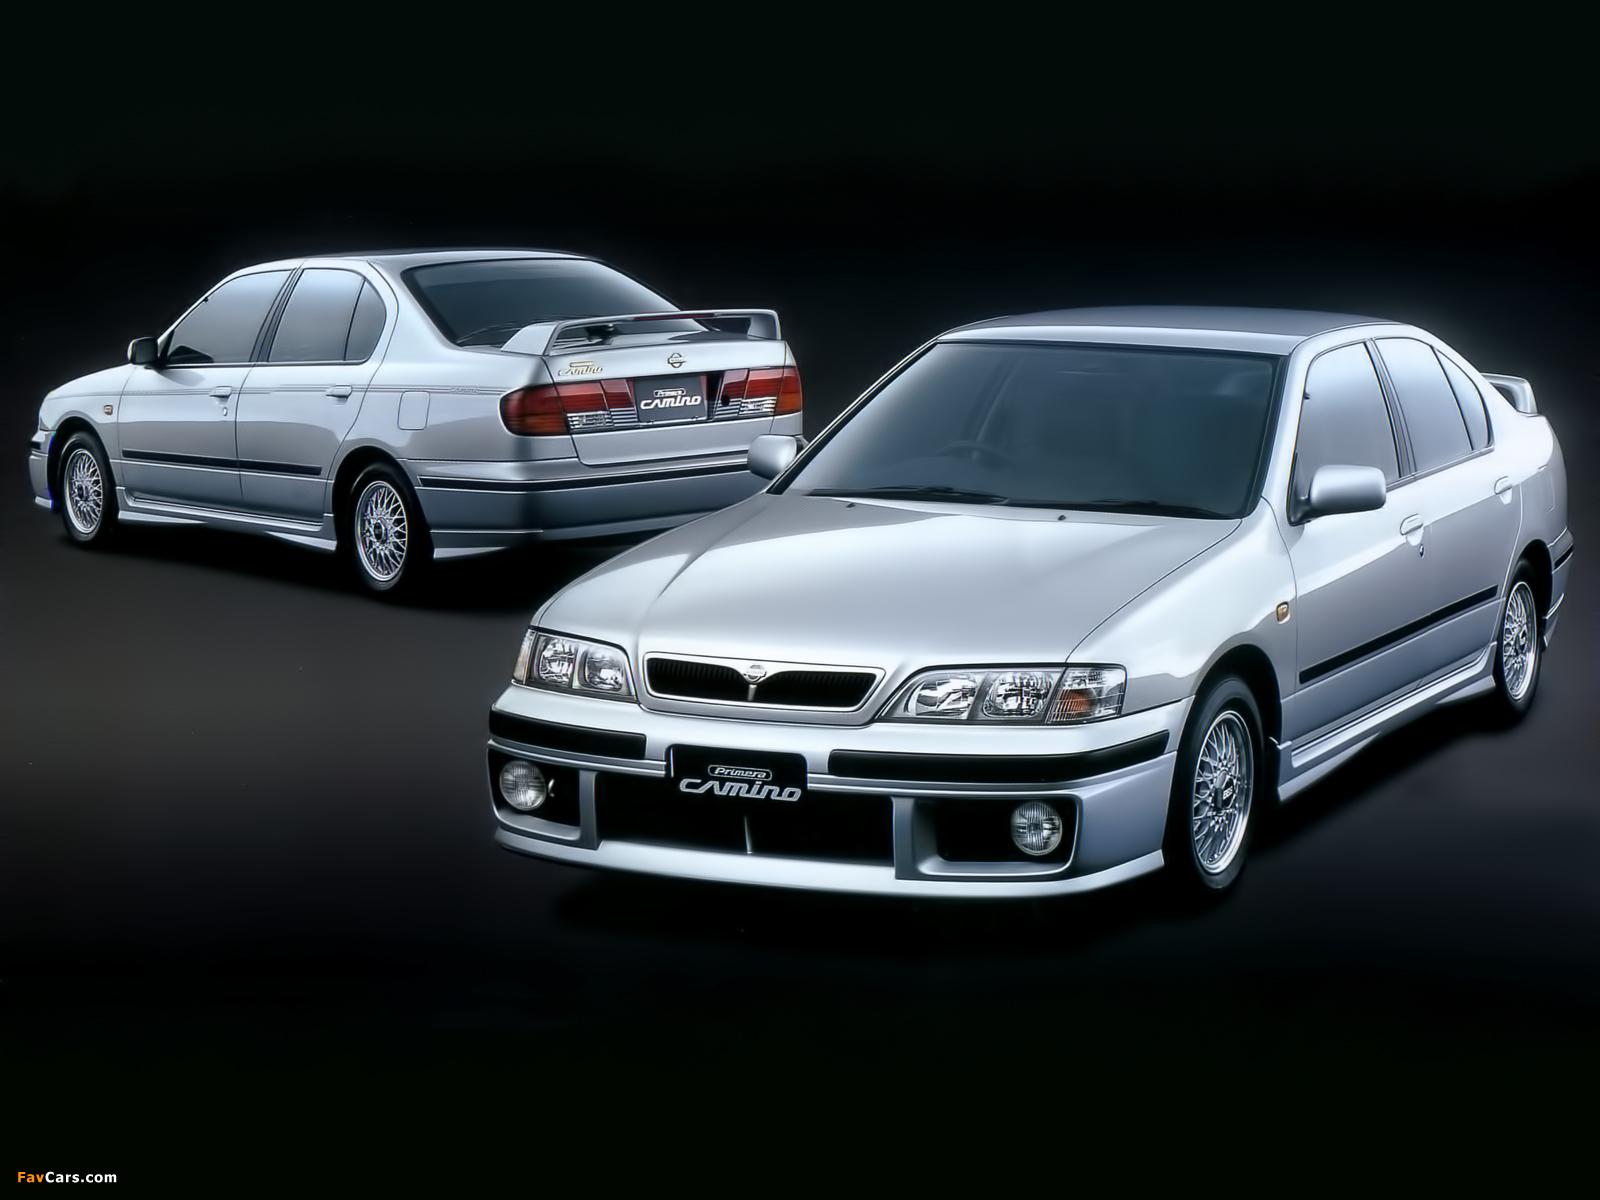 Toyota Carina — легендарная модель